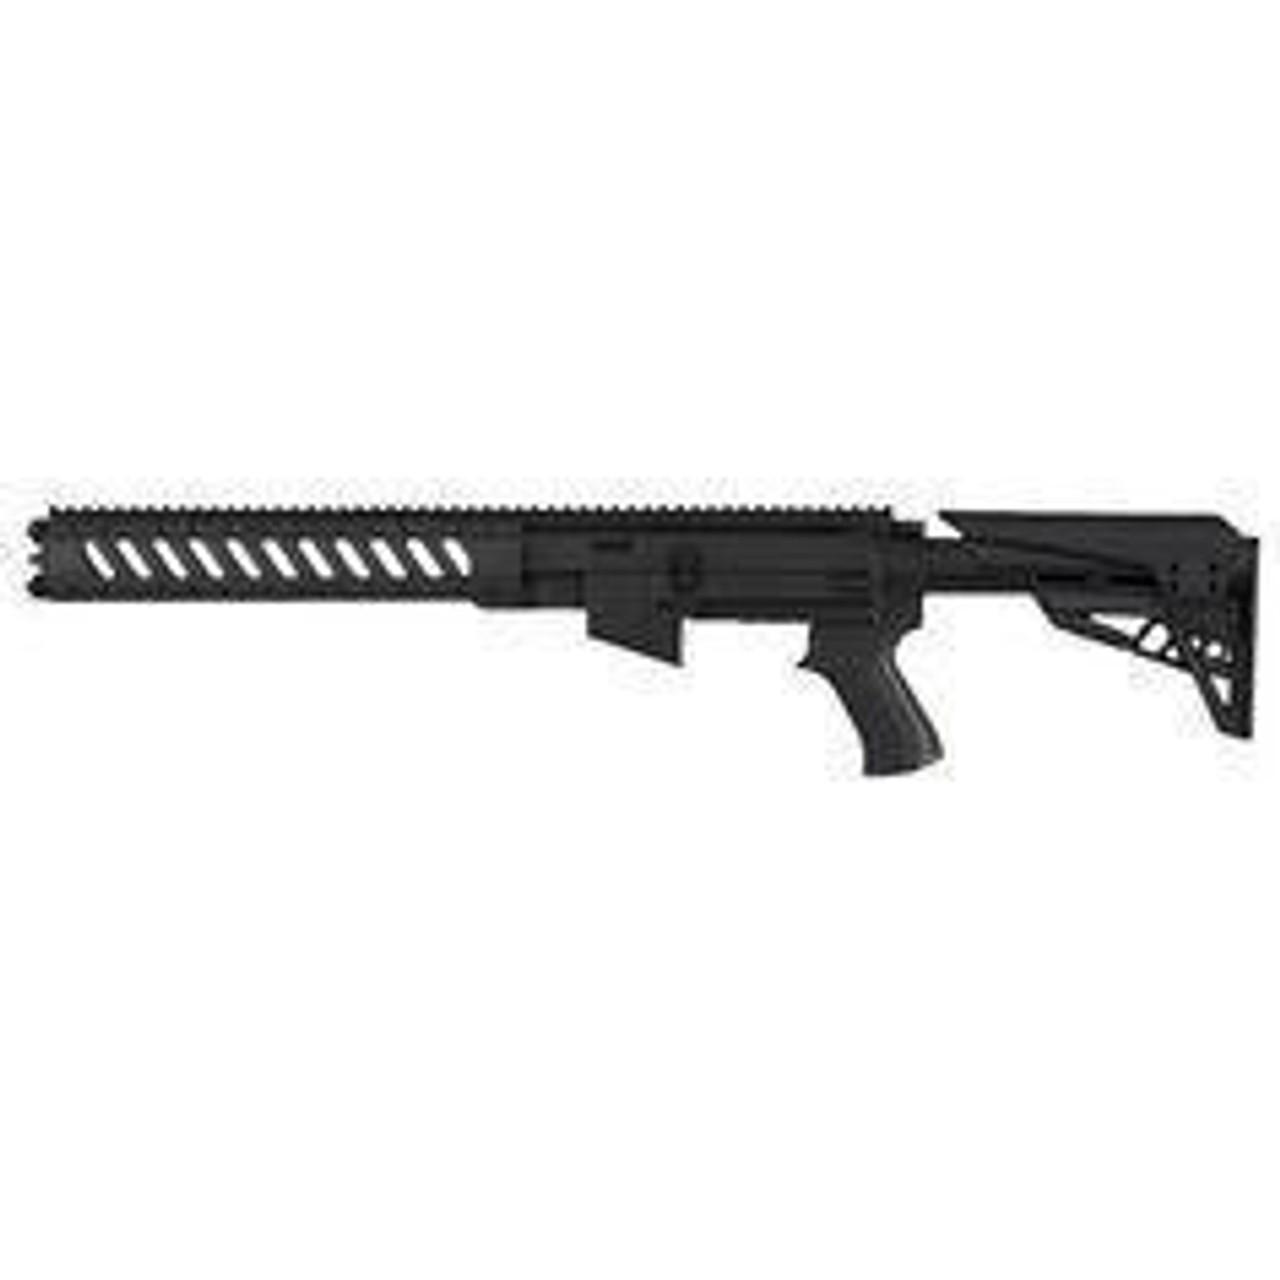 AR-15 TactLite Six Position Mil-Spec Stock